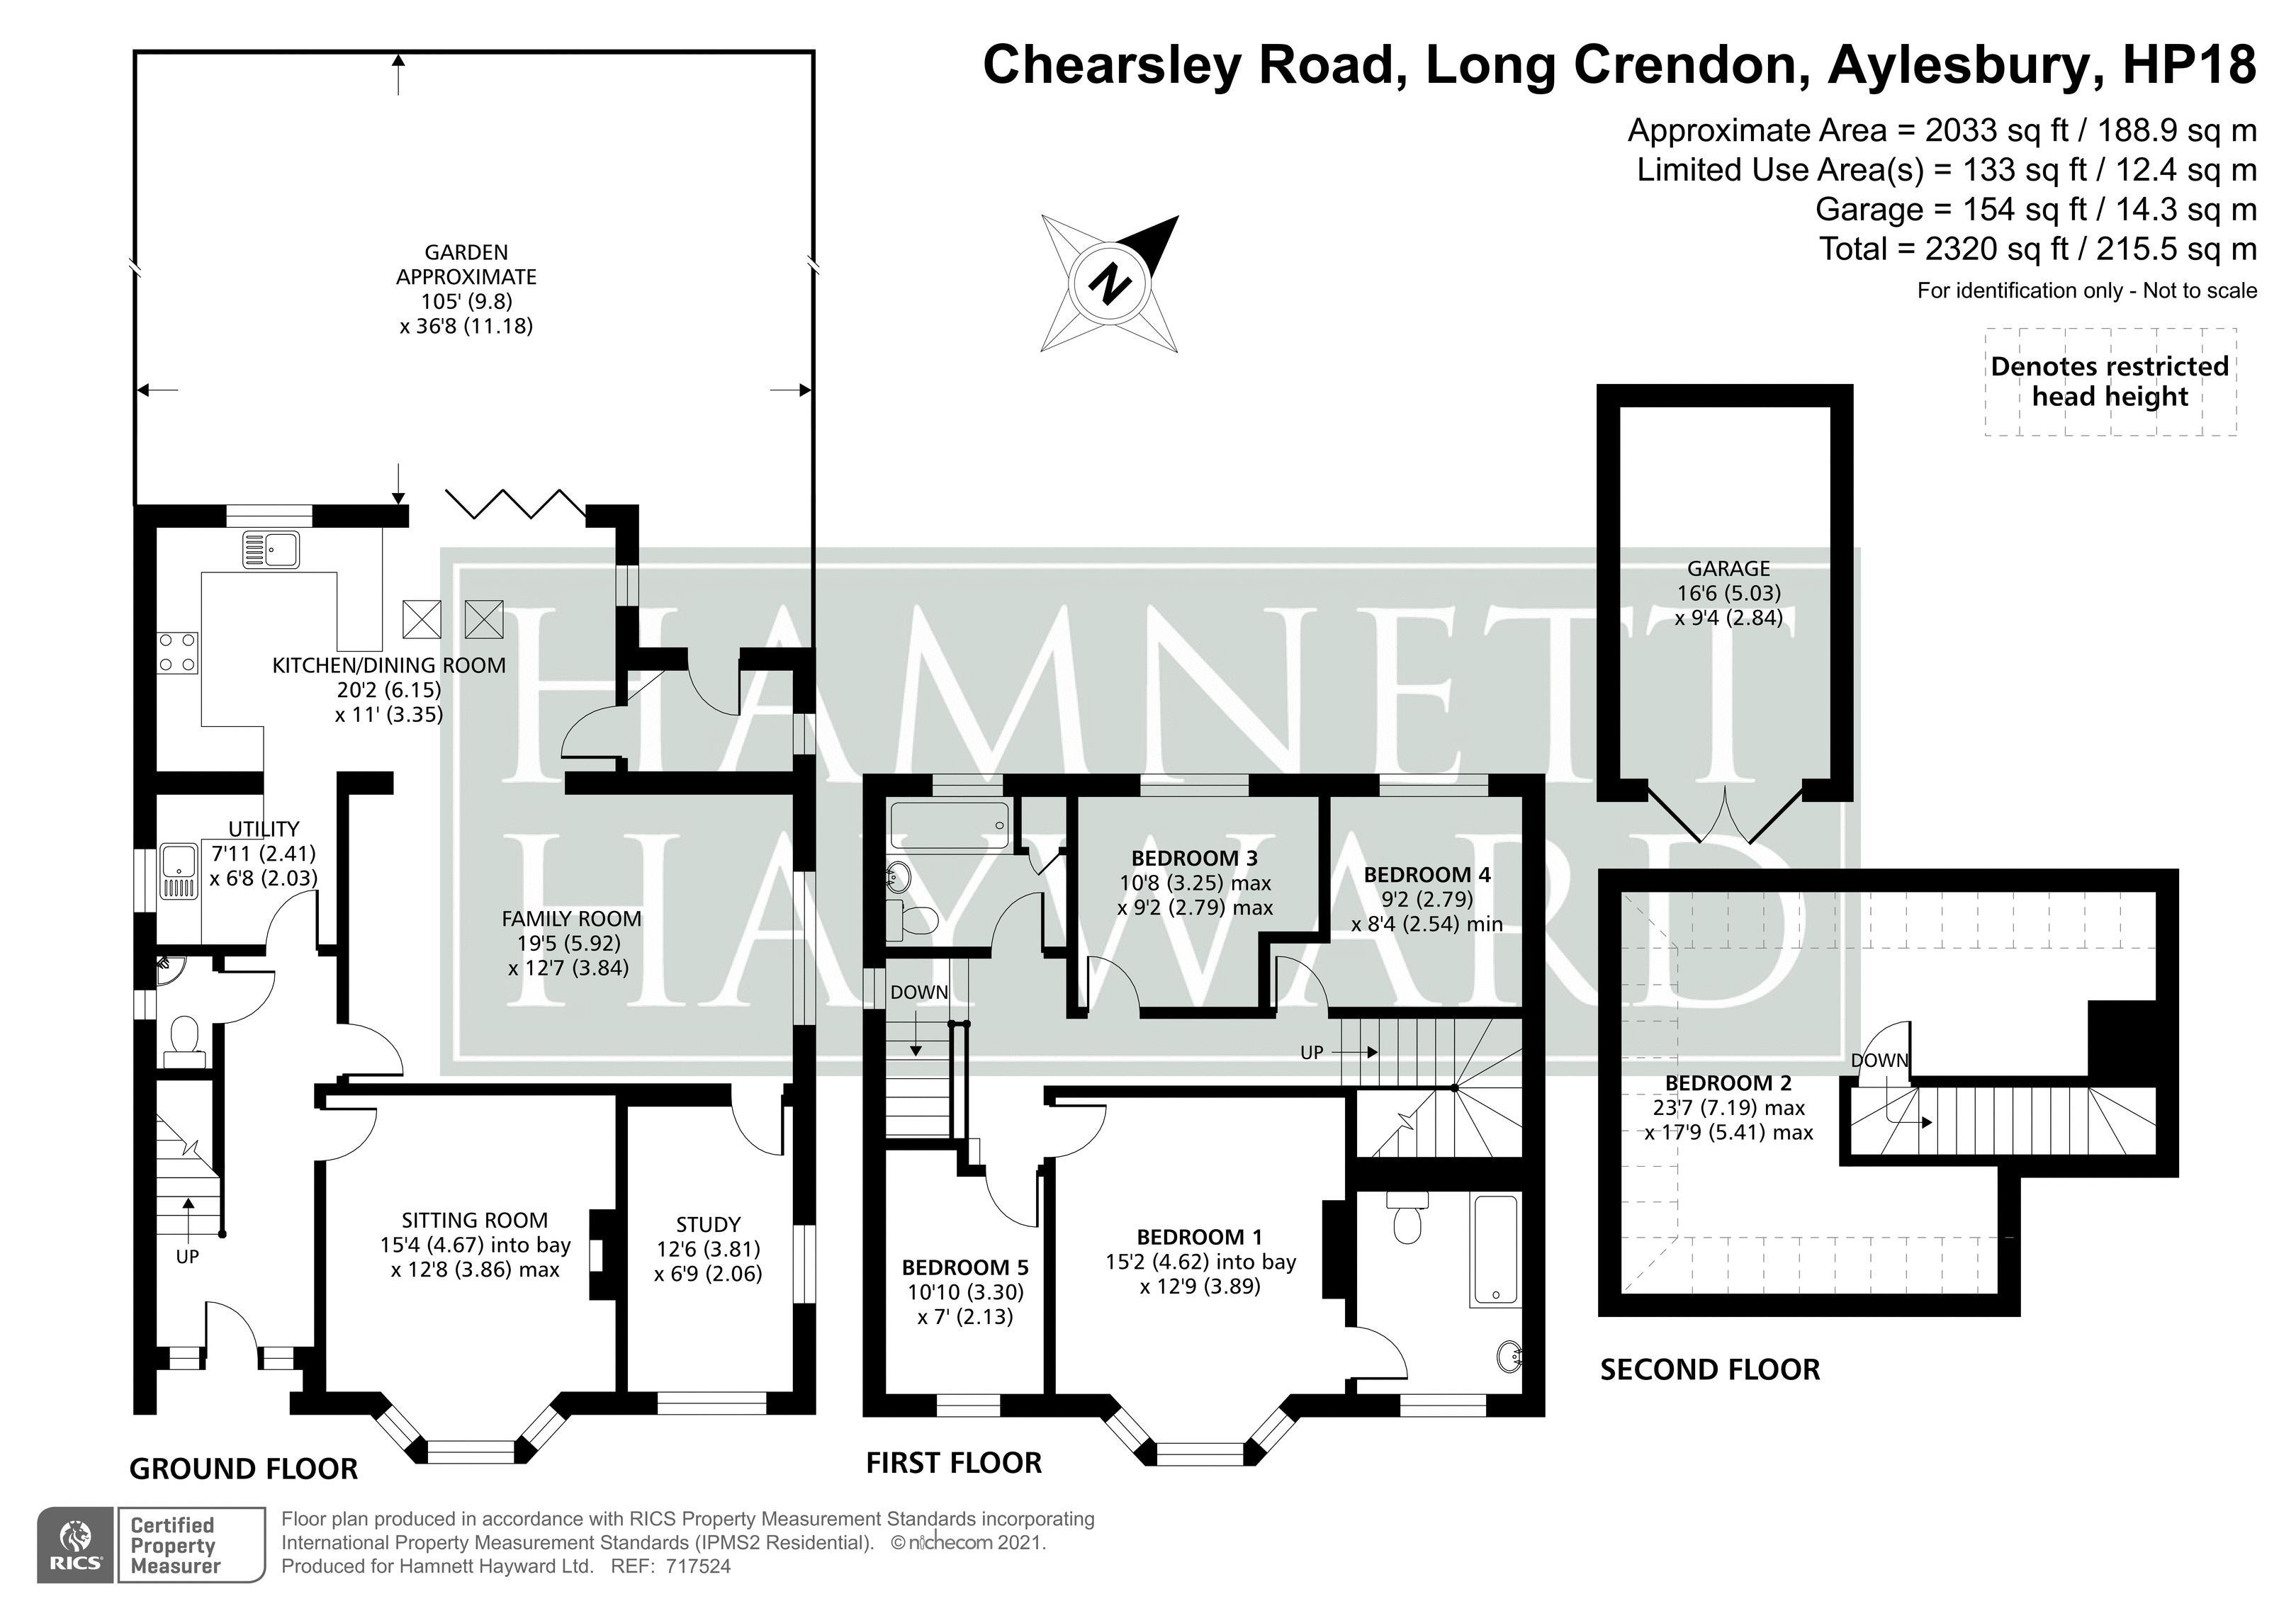 Chearsley Road Long Crendon